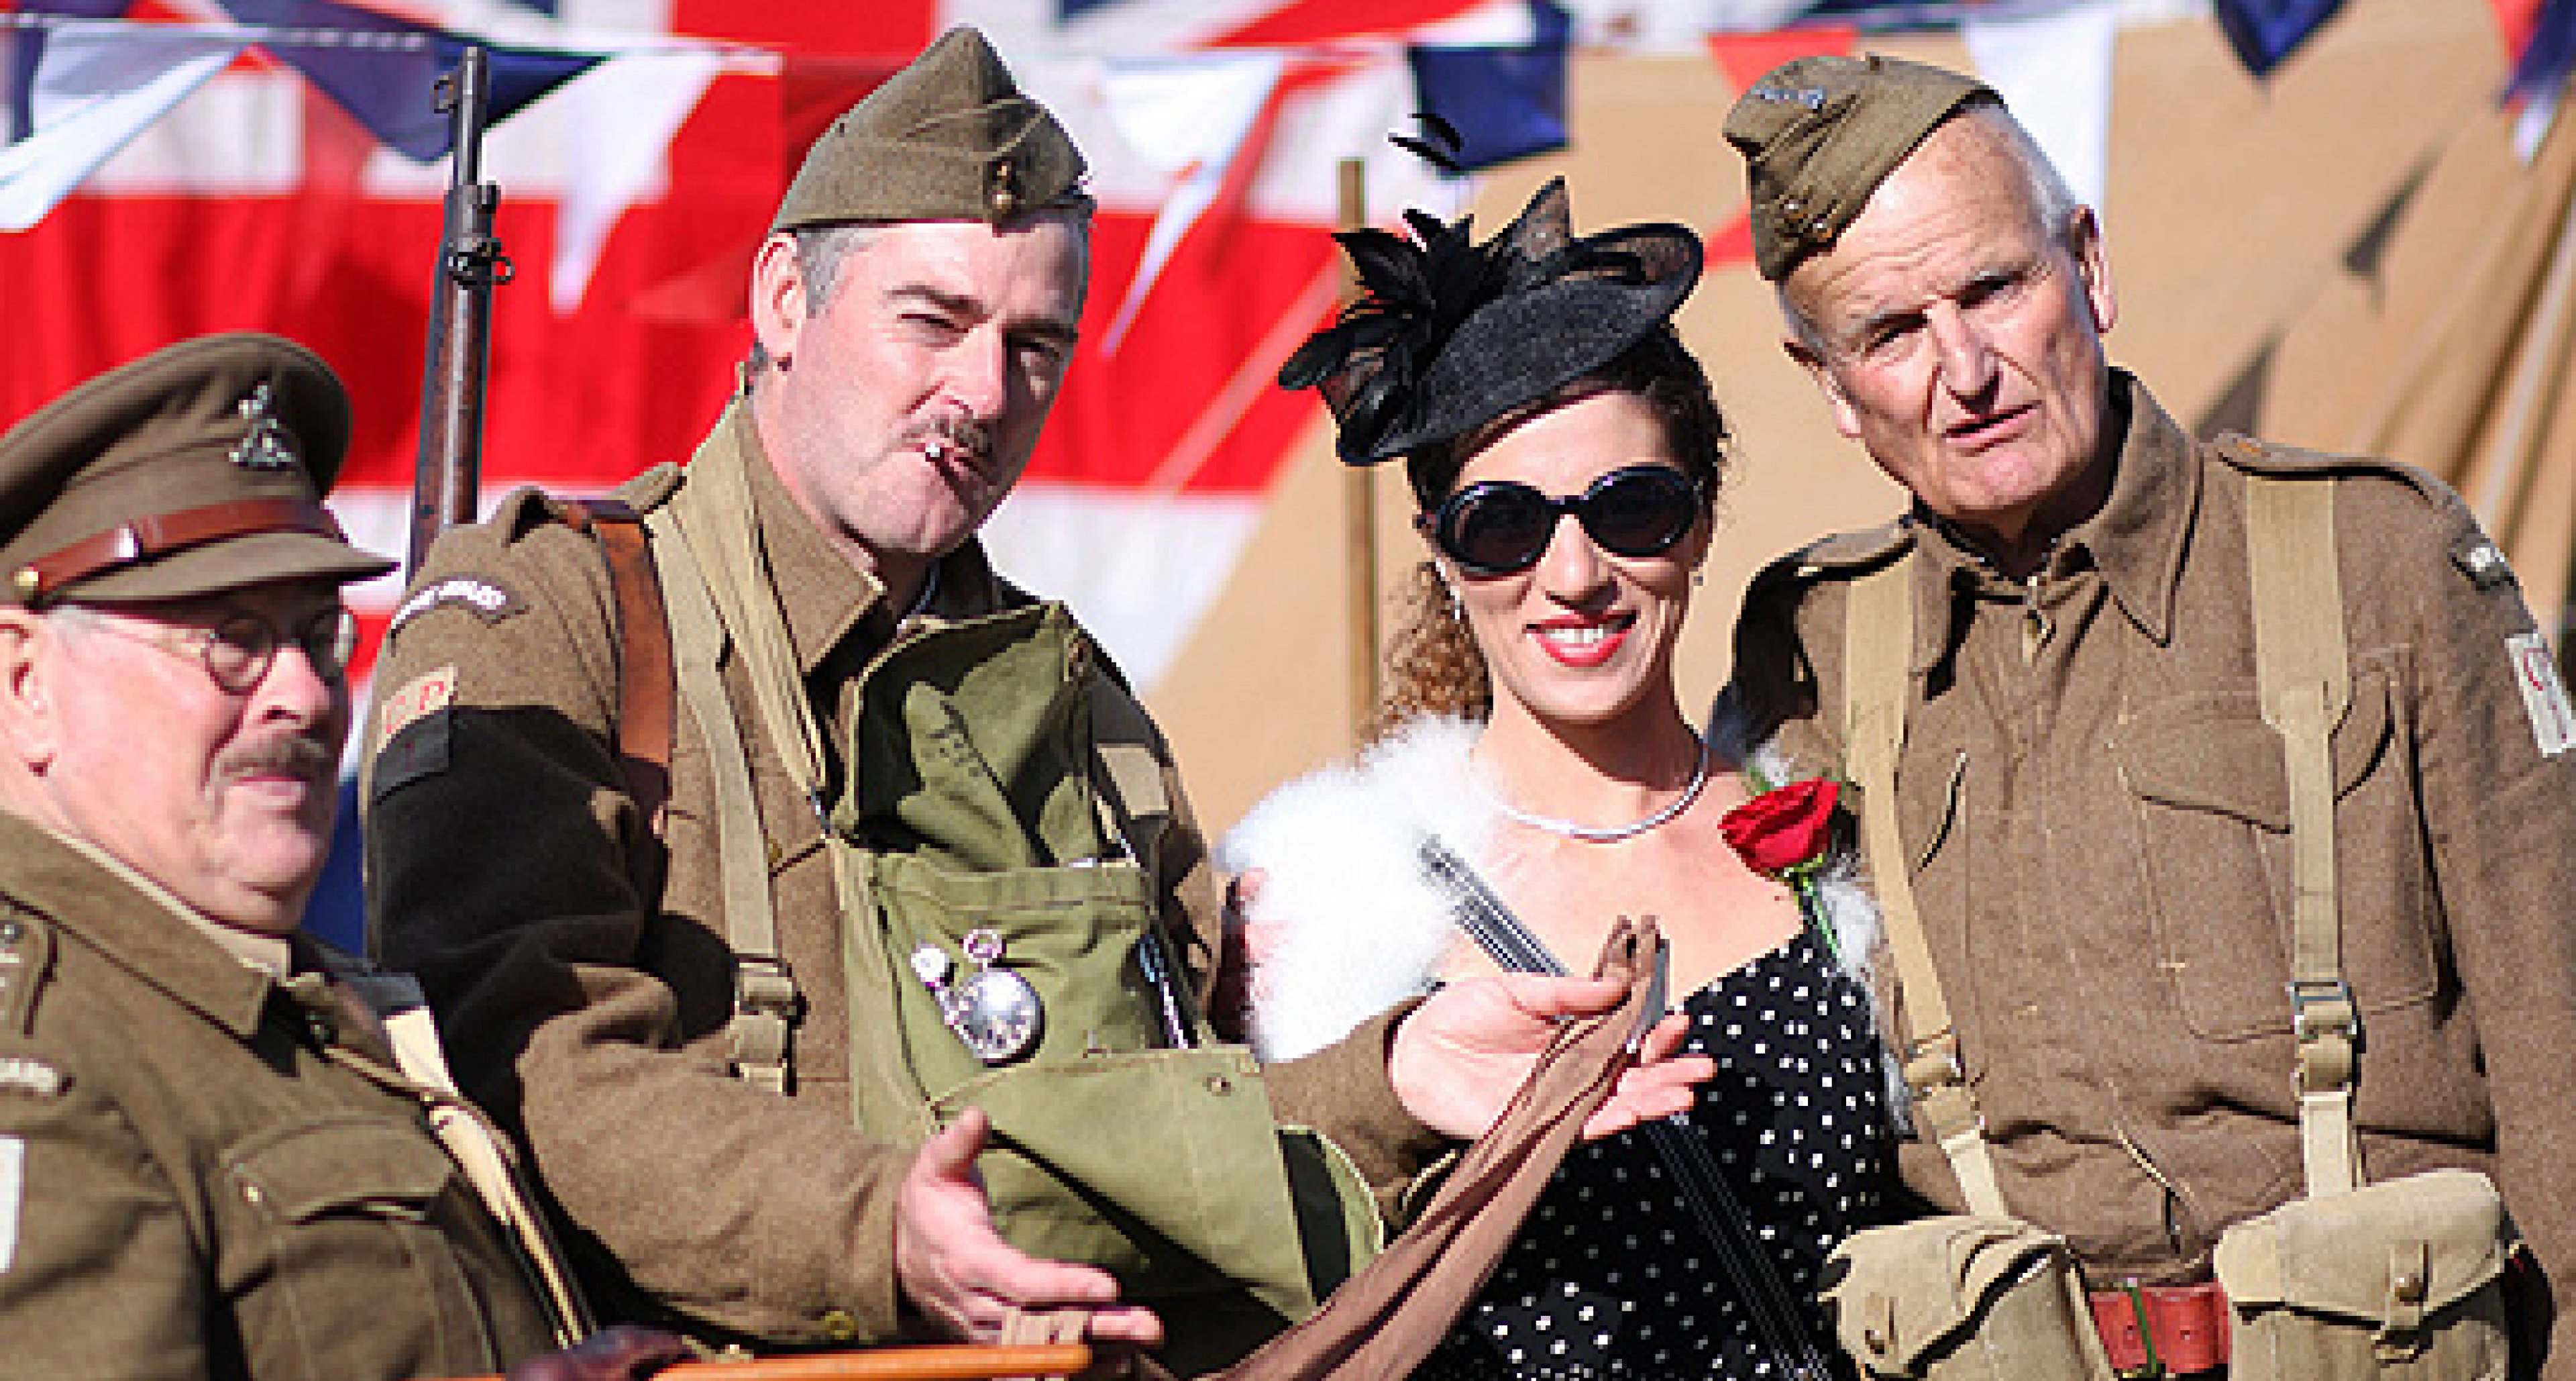 Goodwood Revival 2010: Lungern mit den Truppen verboten!